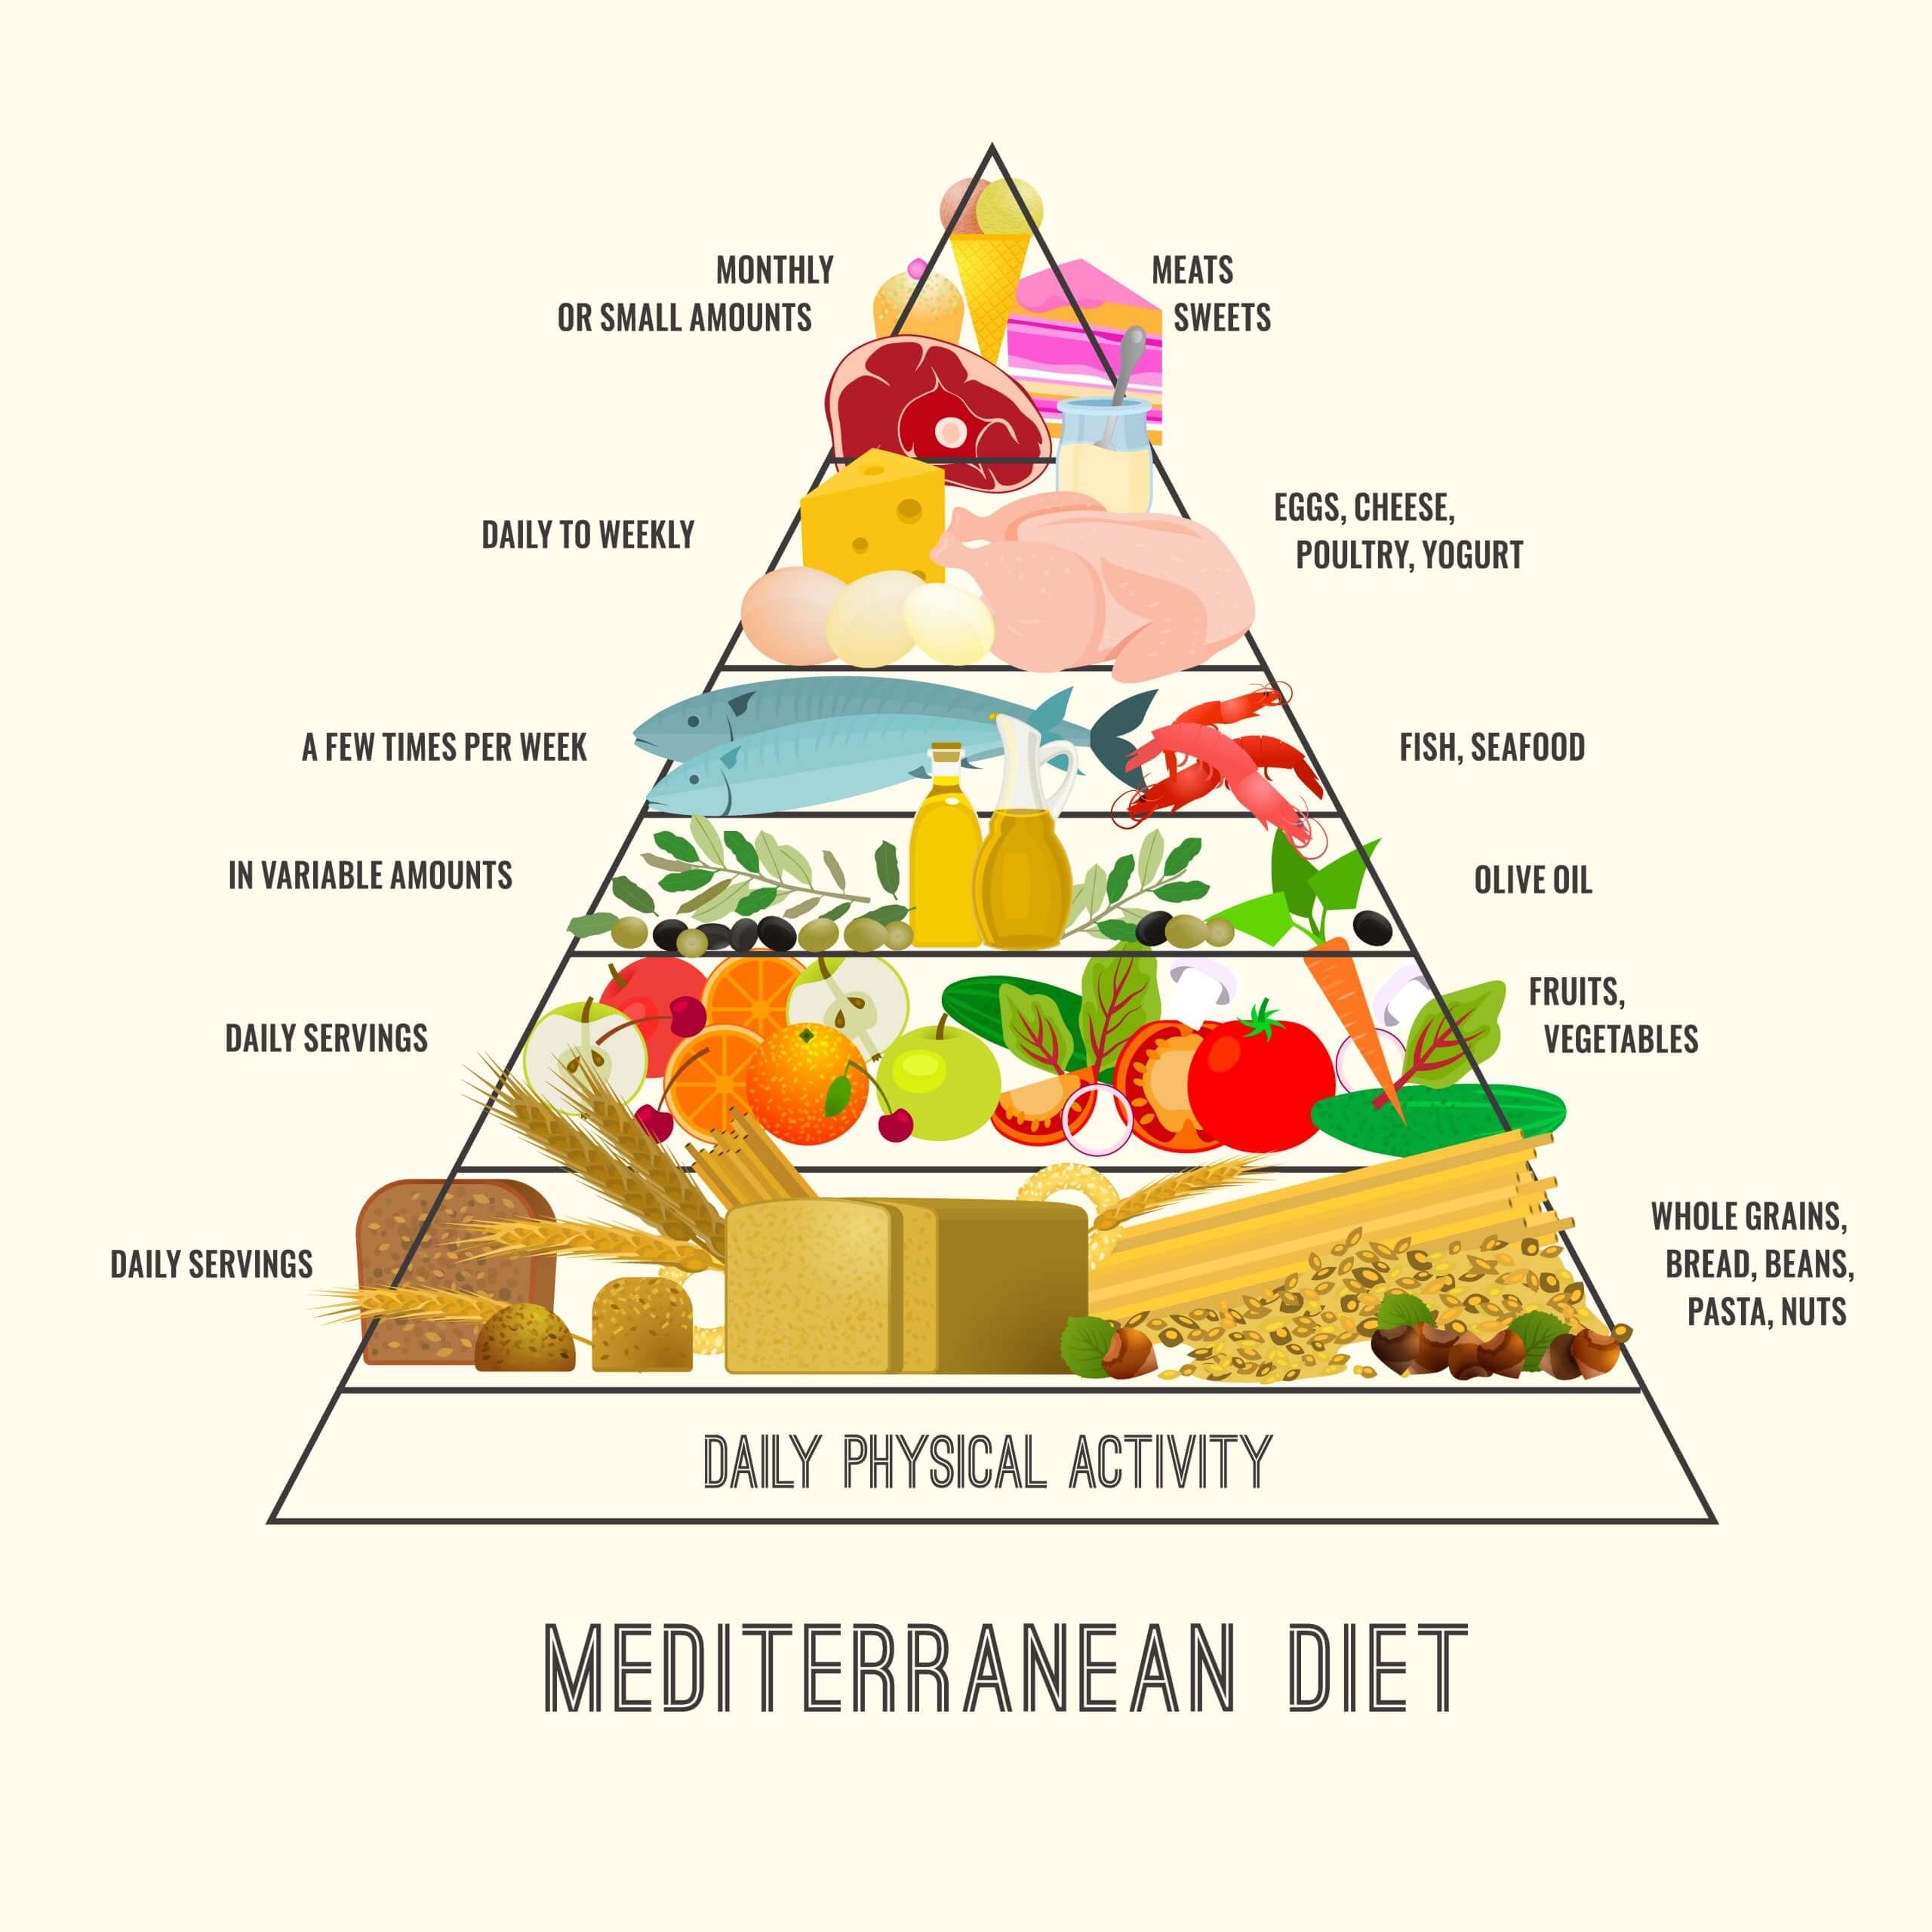 food pyramid of the Mediterranean diet